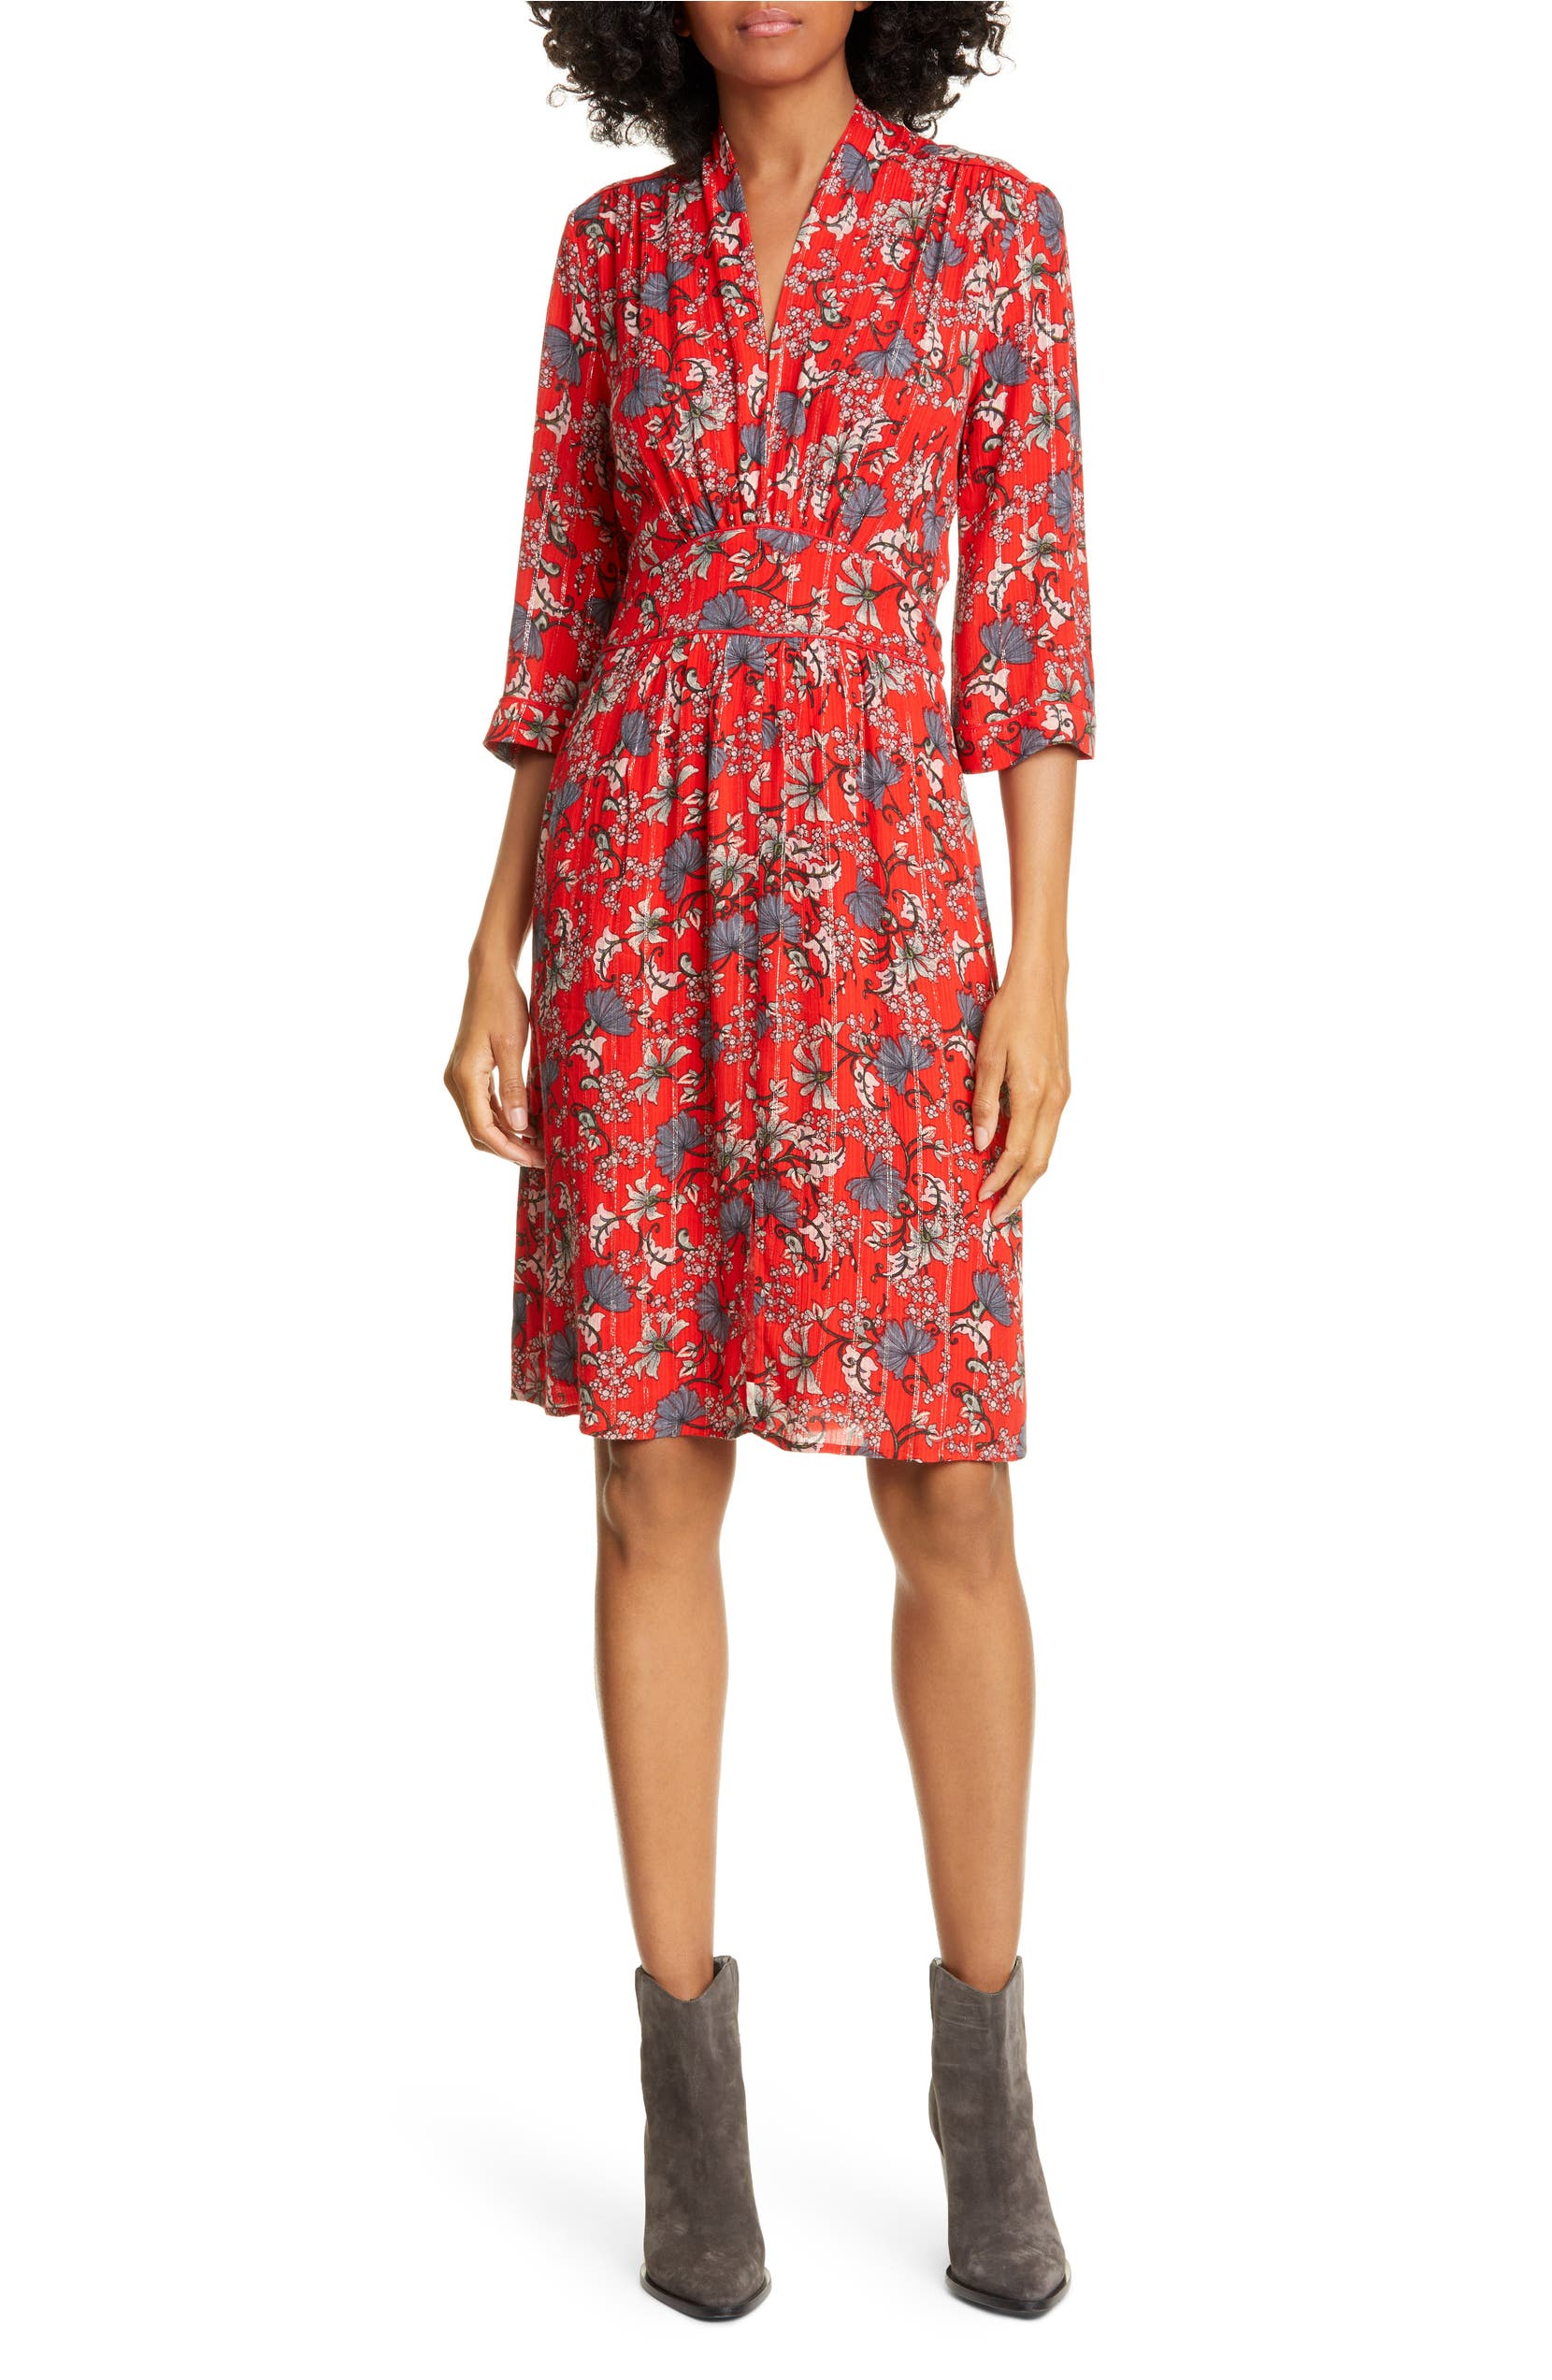 4e80a7e0bc462 Clotilde Floral Print & Metallic Stripe Dress